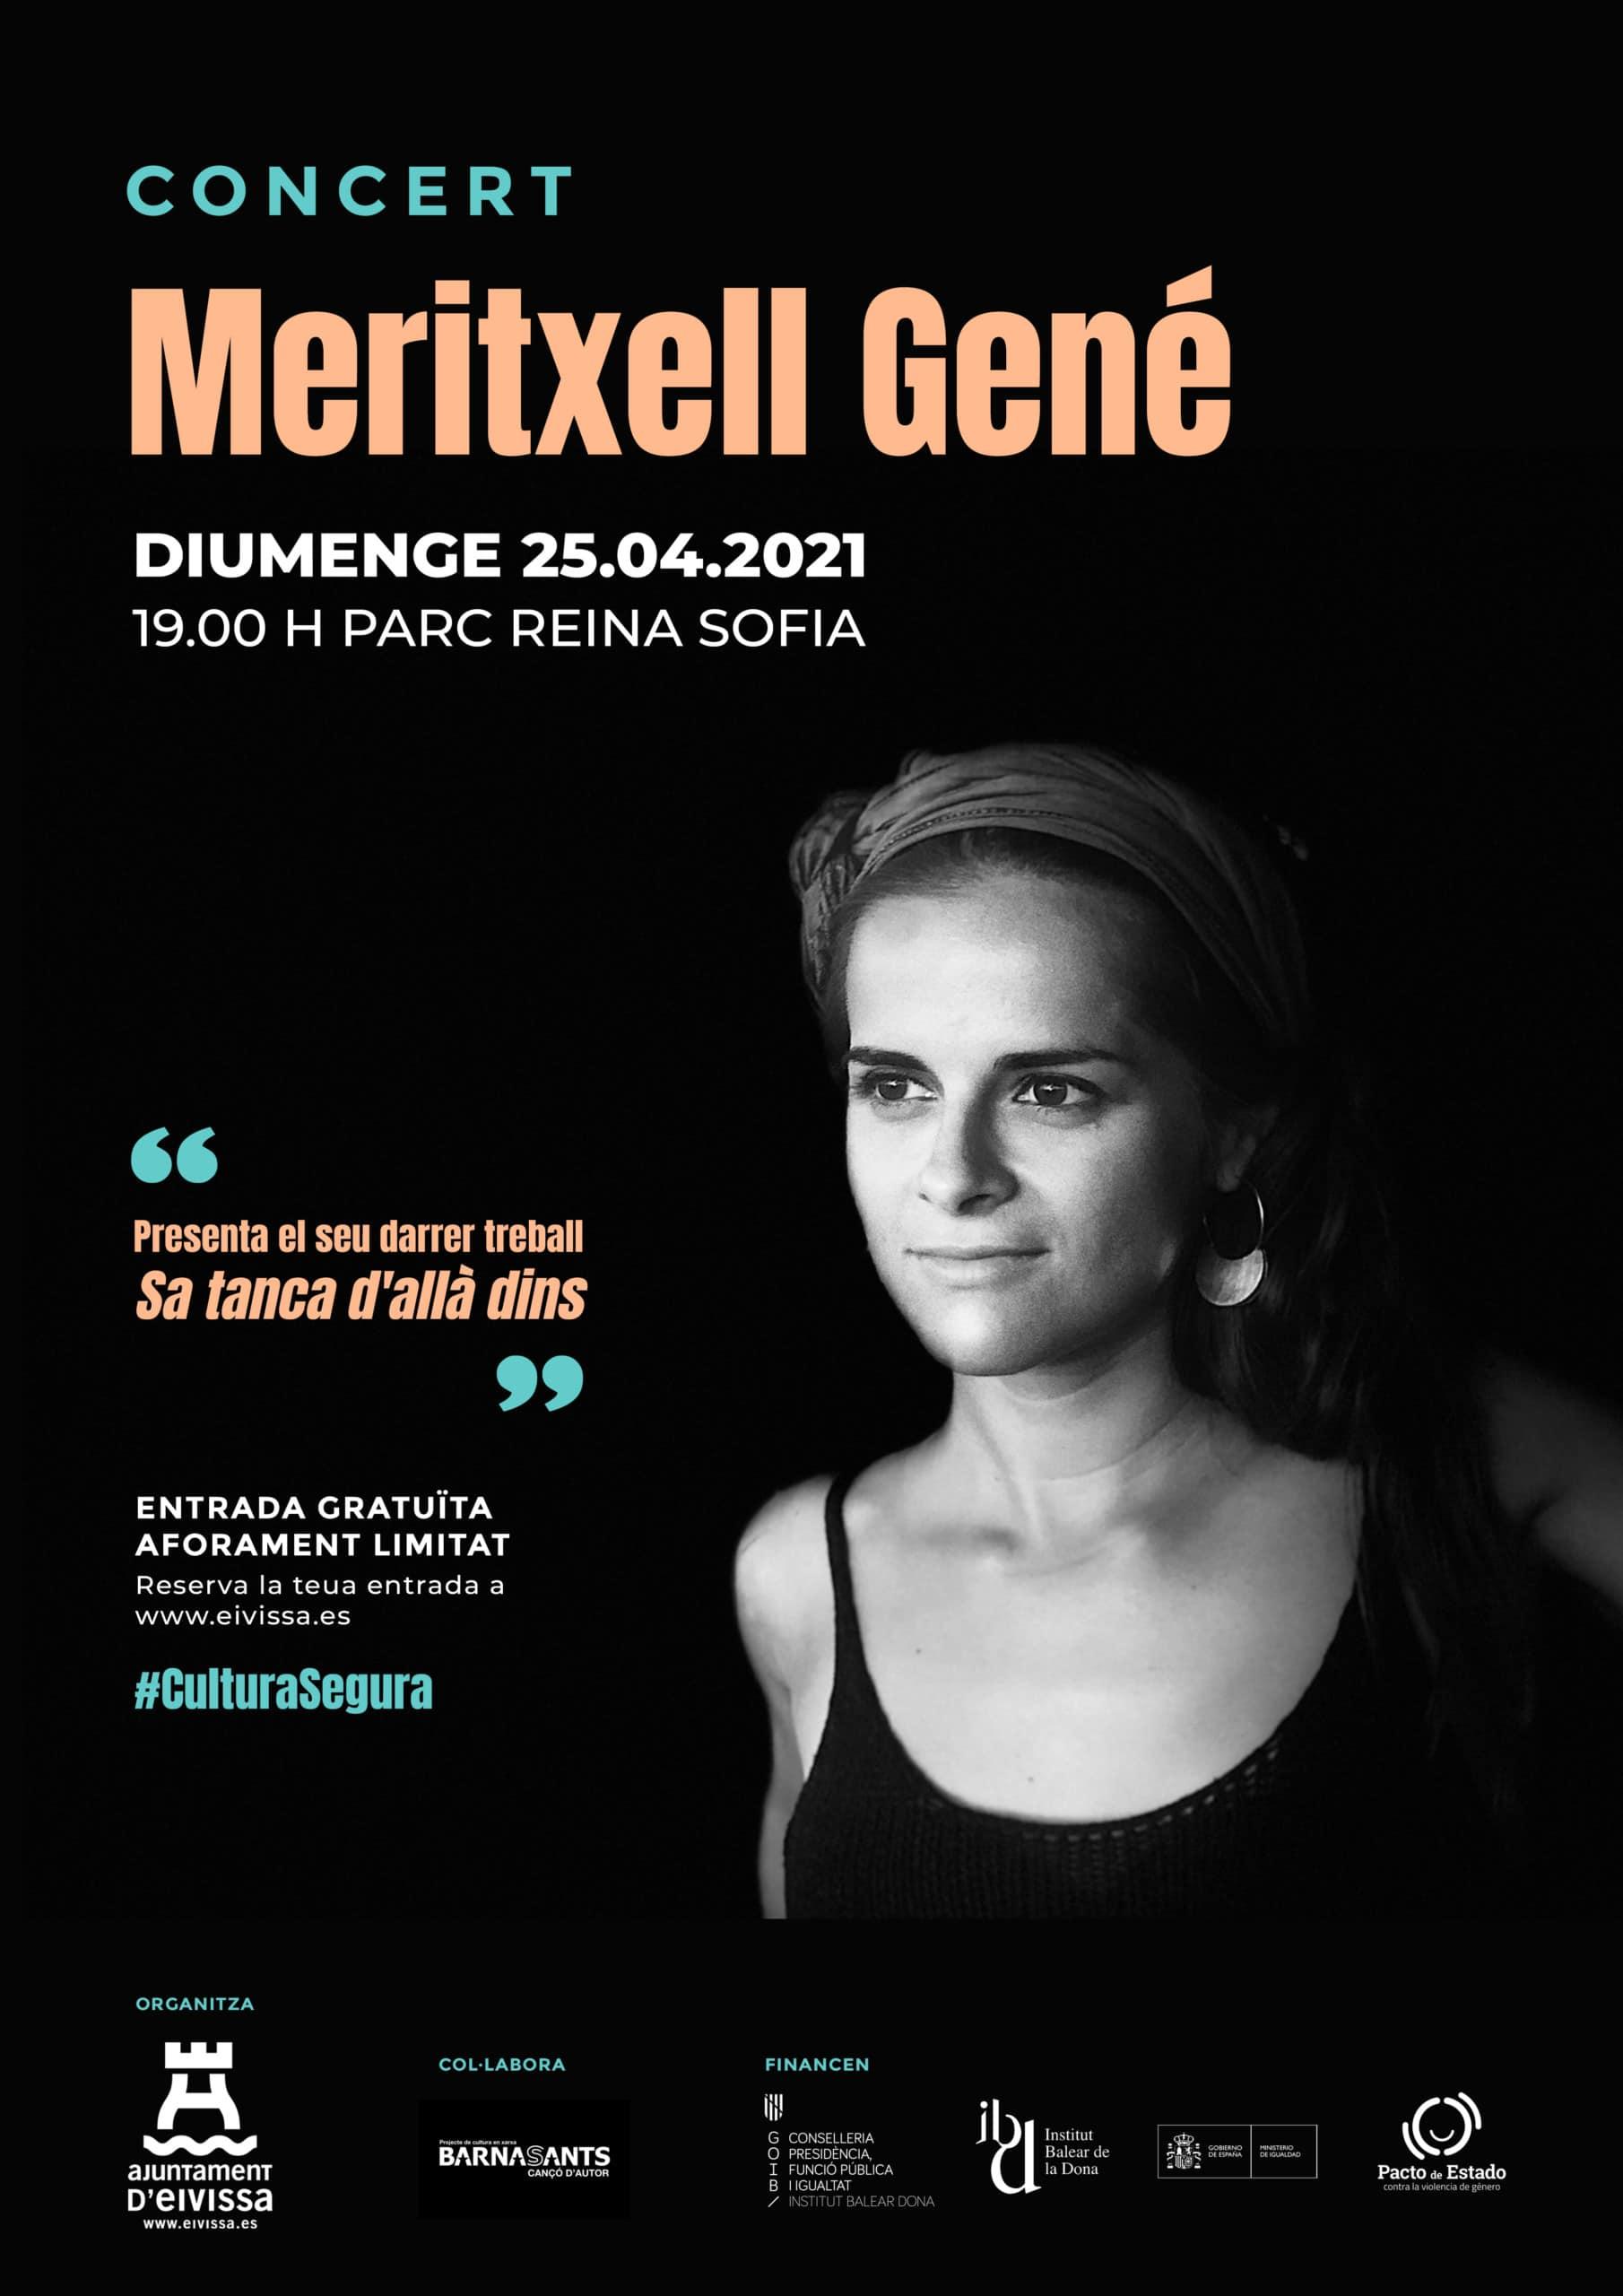 meritxell gene free concert ibiza city hall